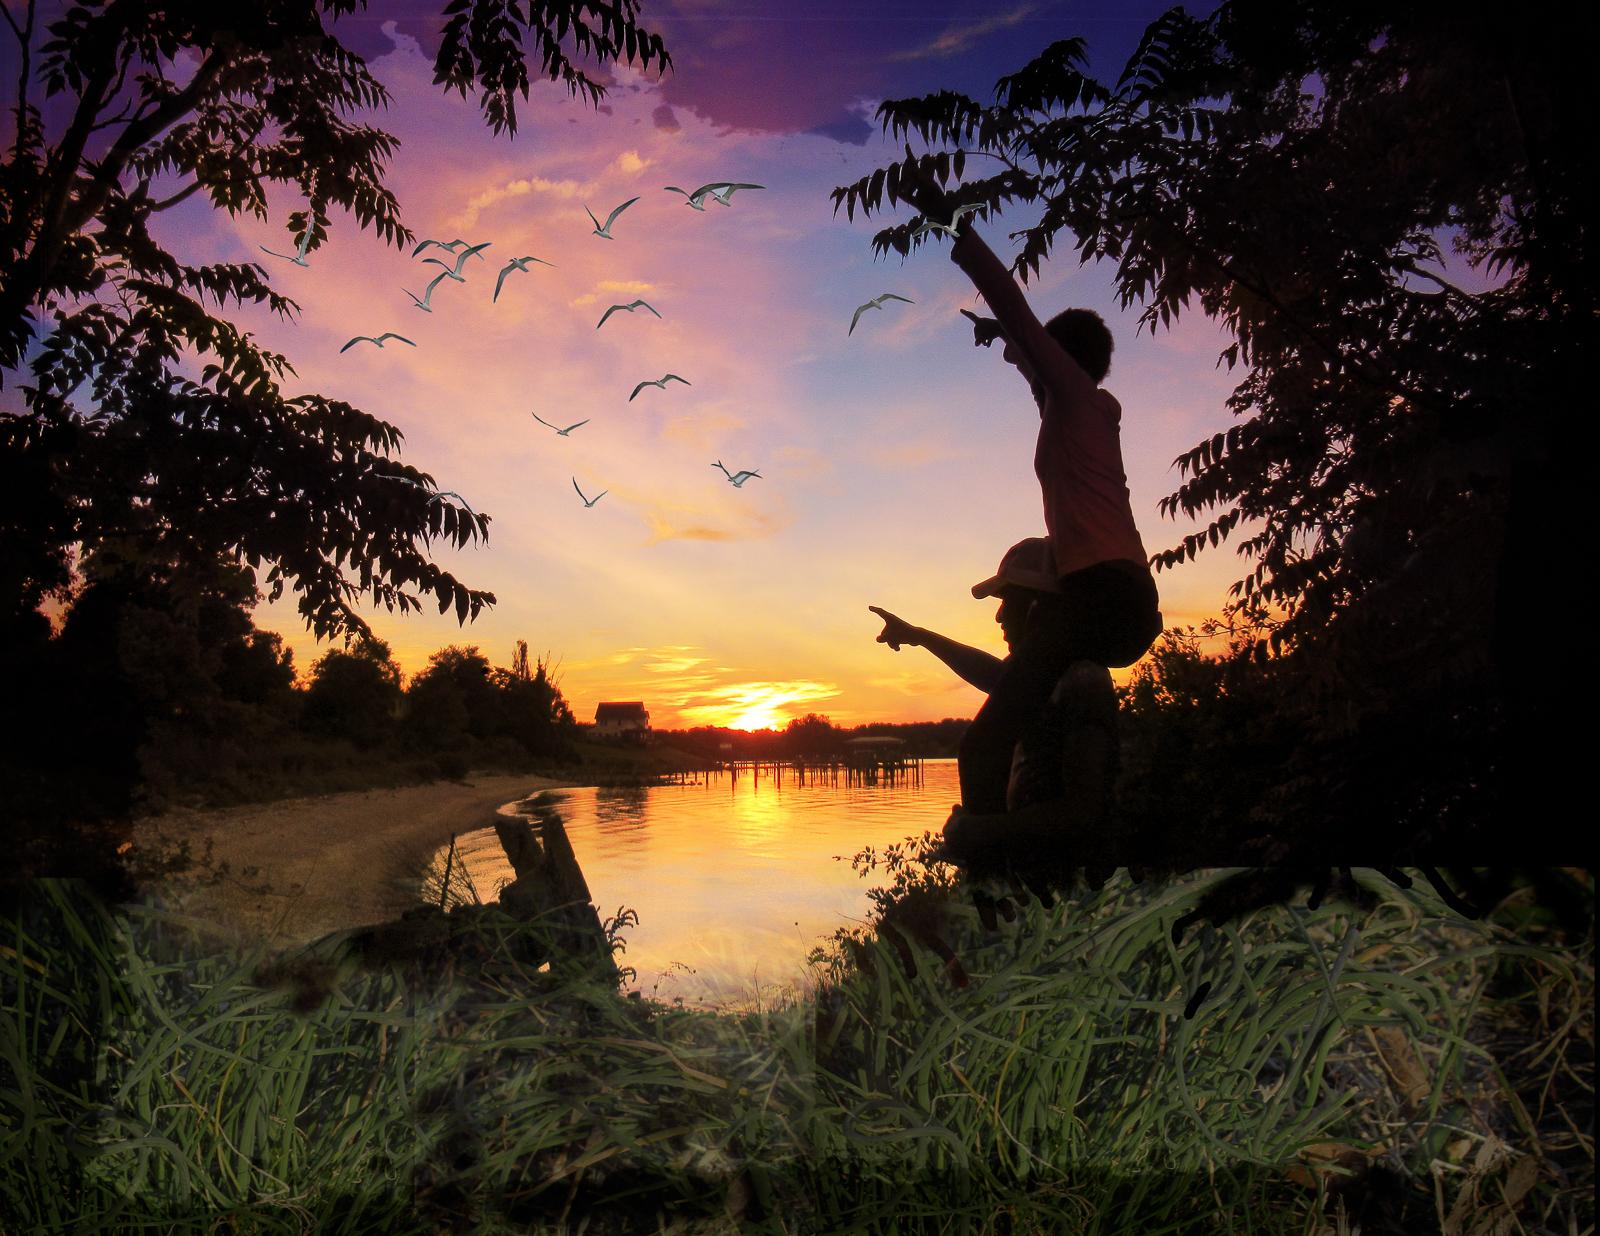 Potomac Sunset, work by R. Taylor Cullar (MG: June 2021)